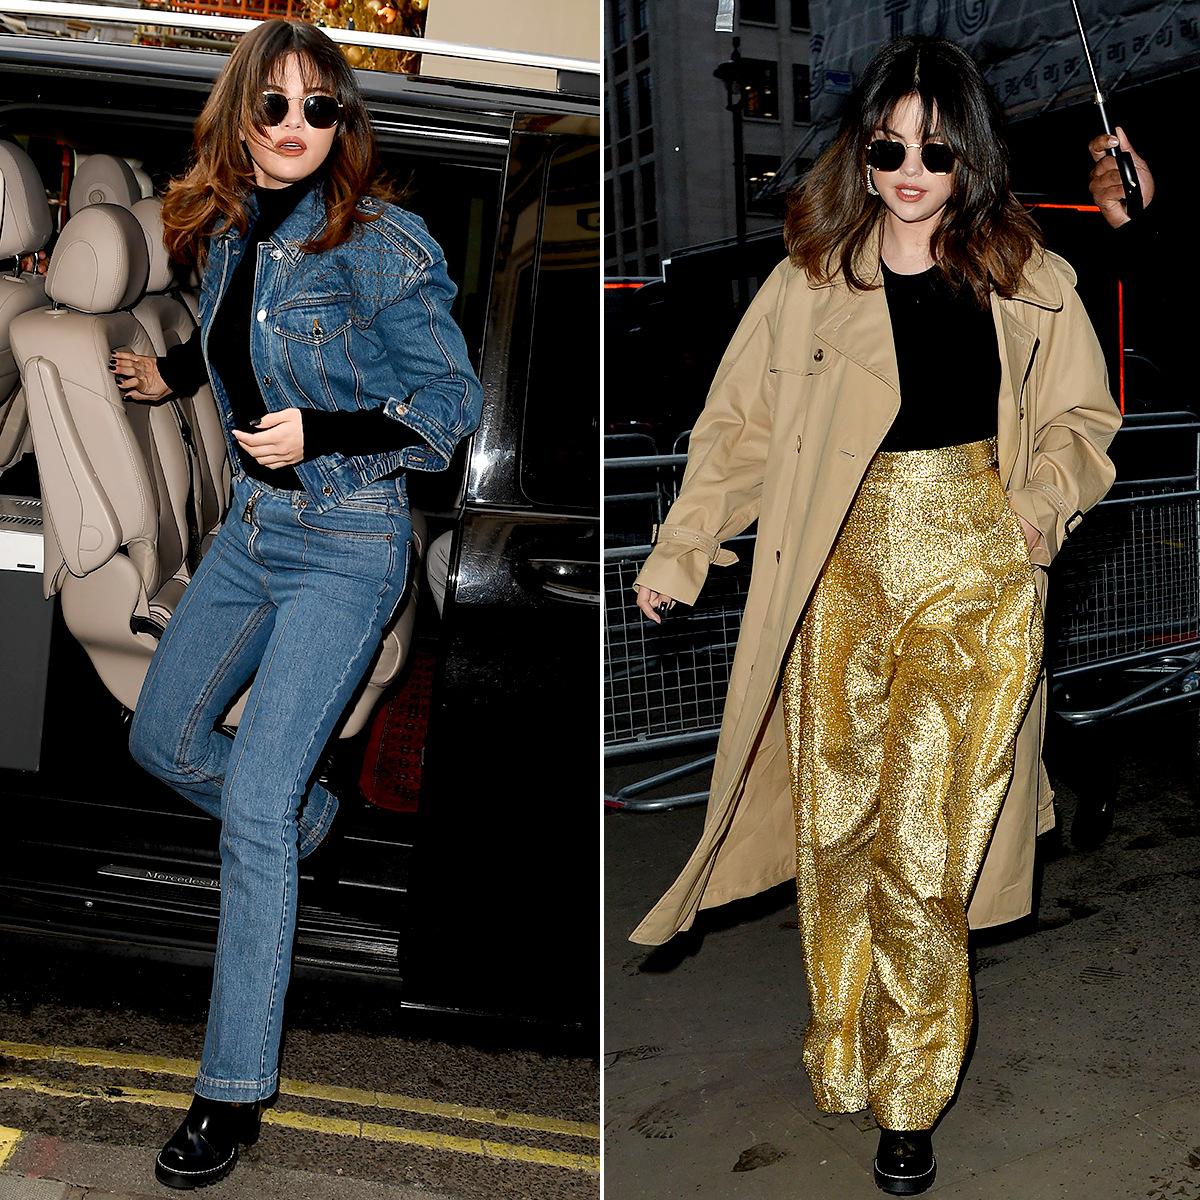 Selena Gomez Paris looks